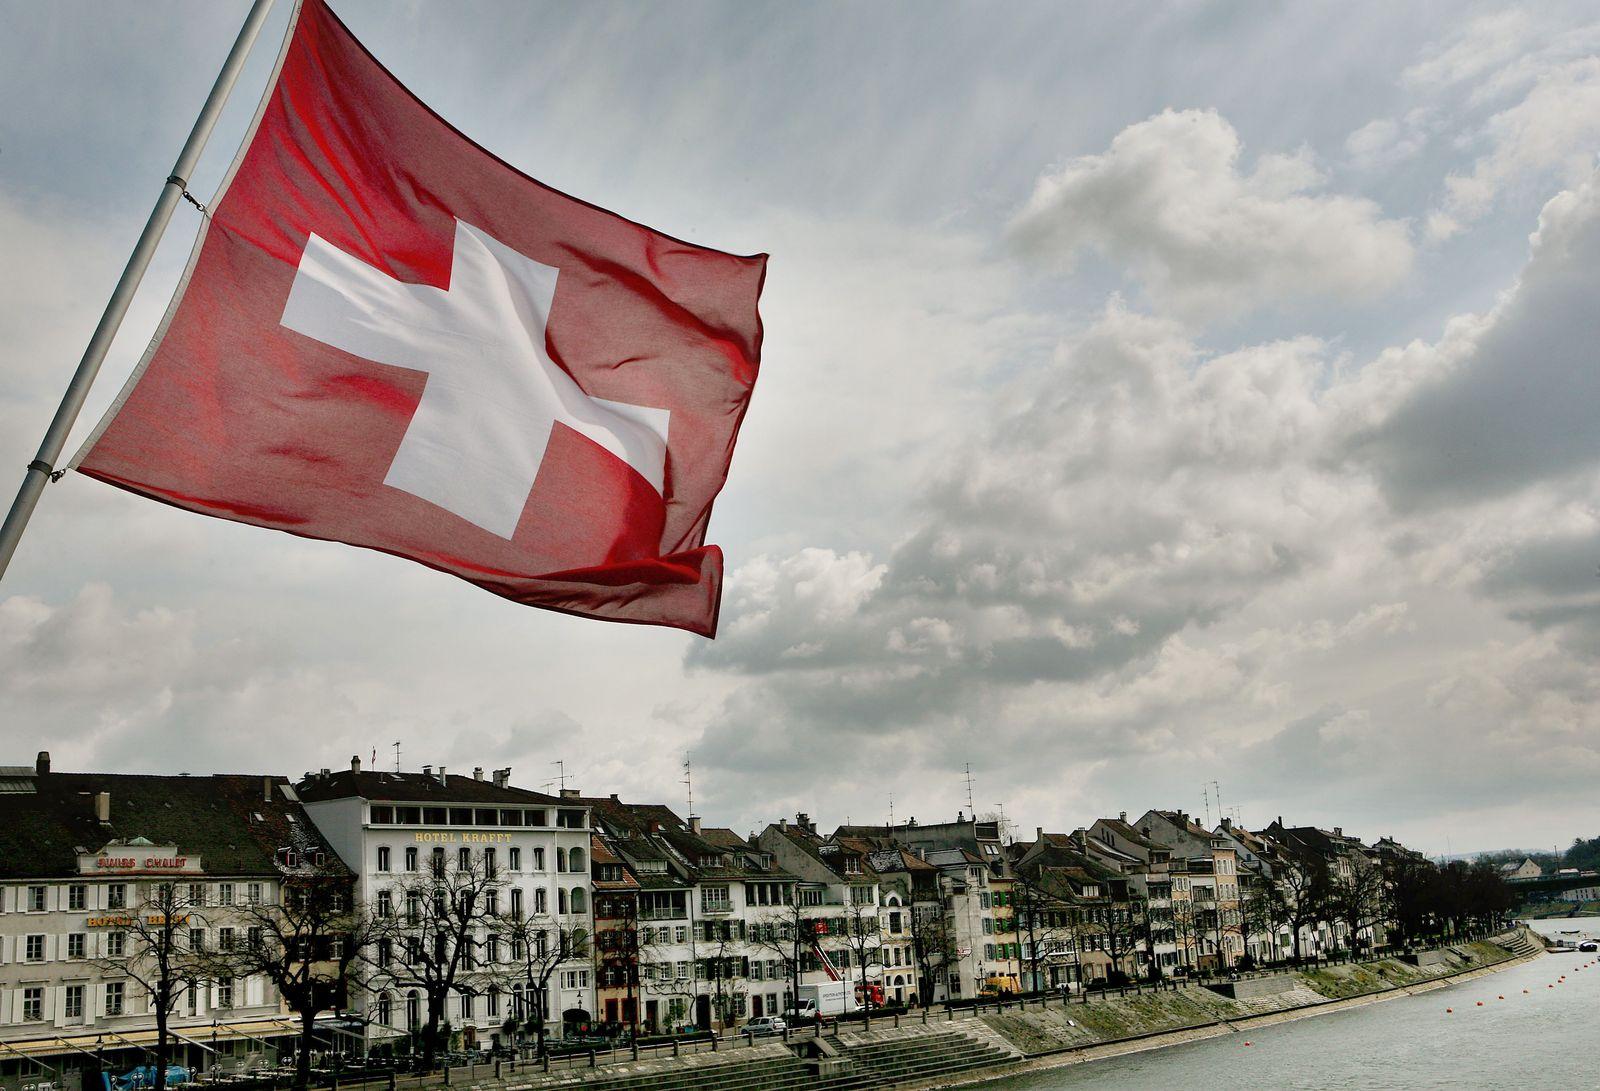 Krach um Steueroasen - Schweiz